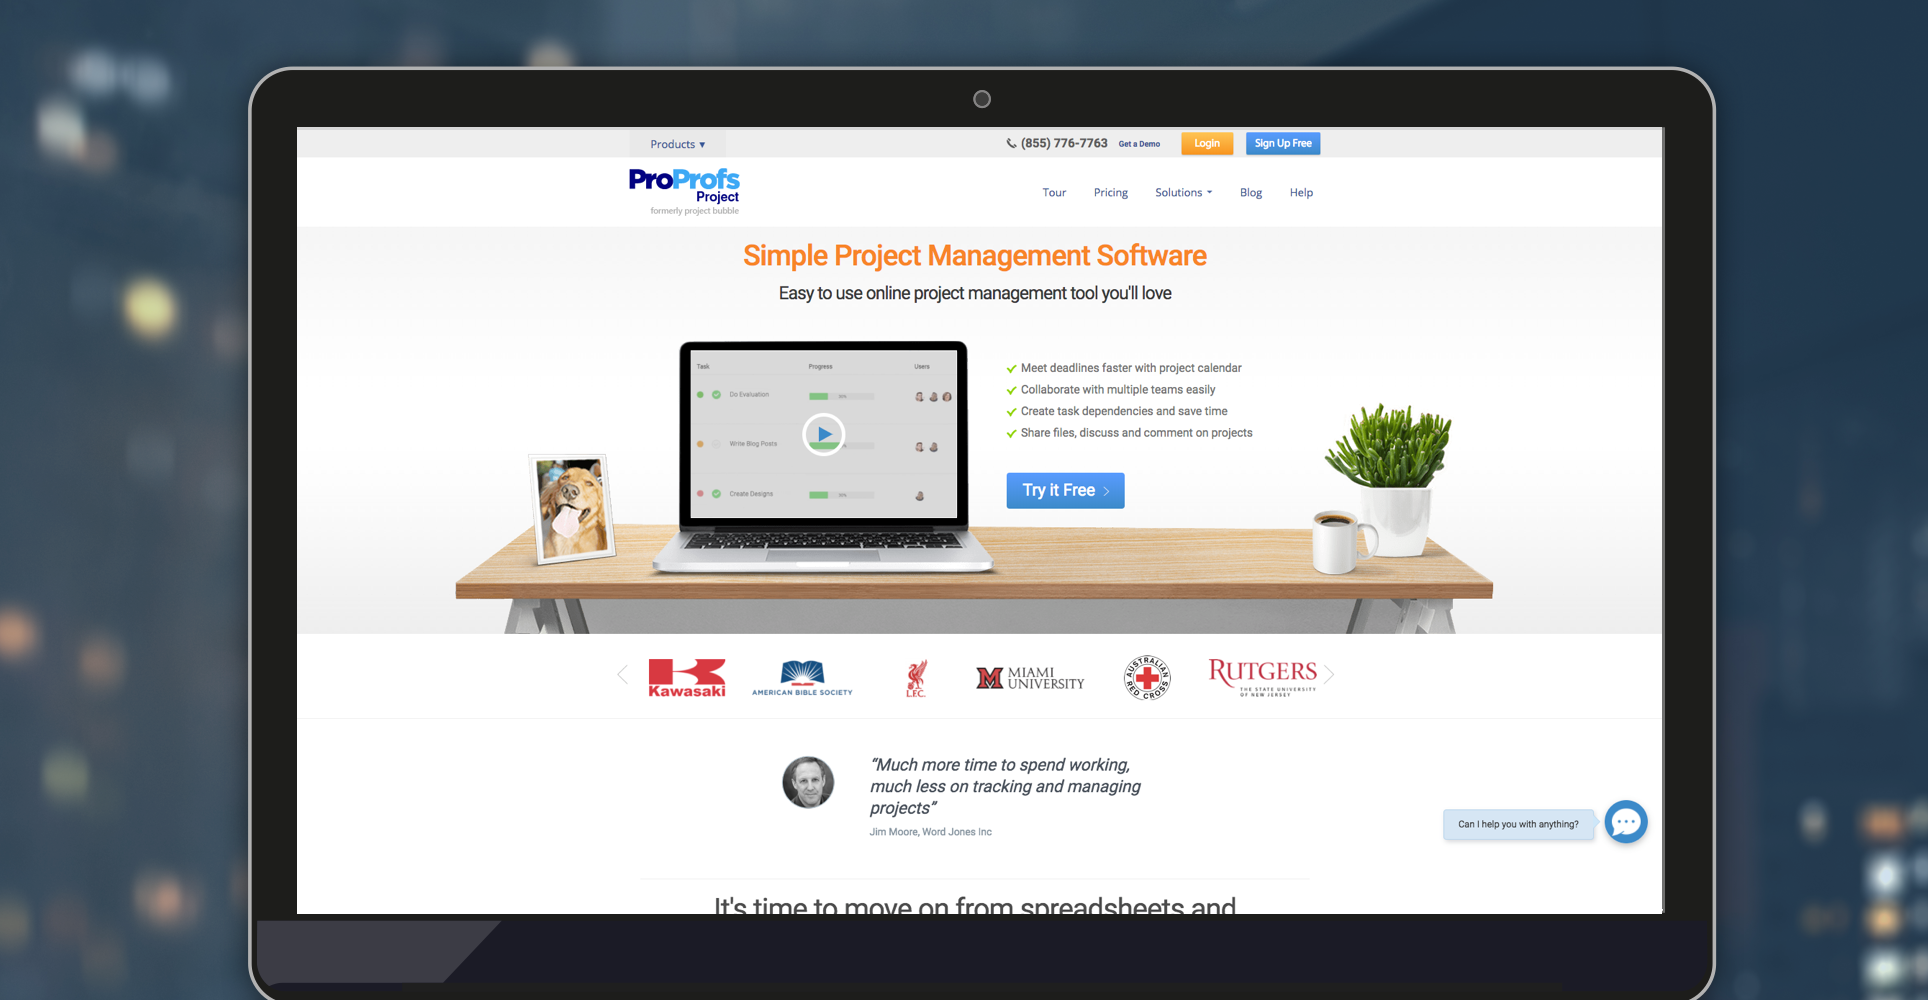 ProProfs Project screenshot